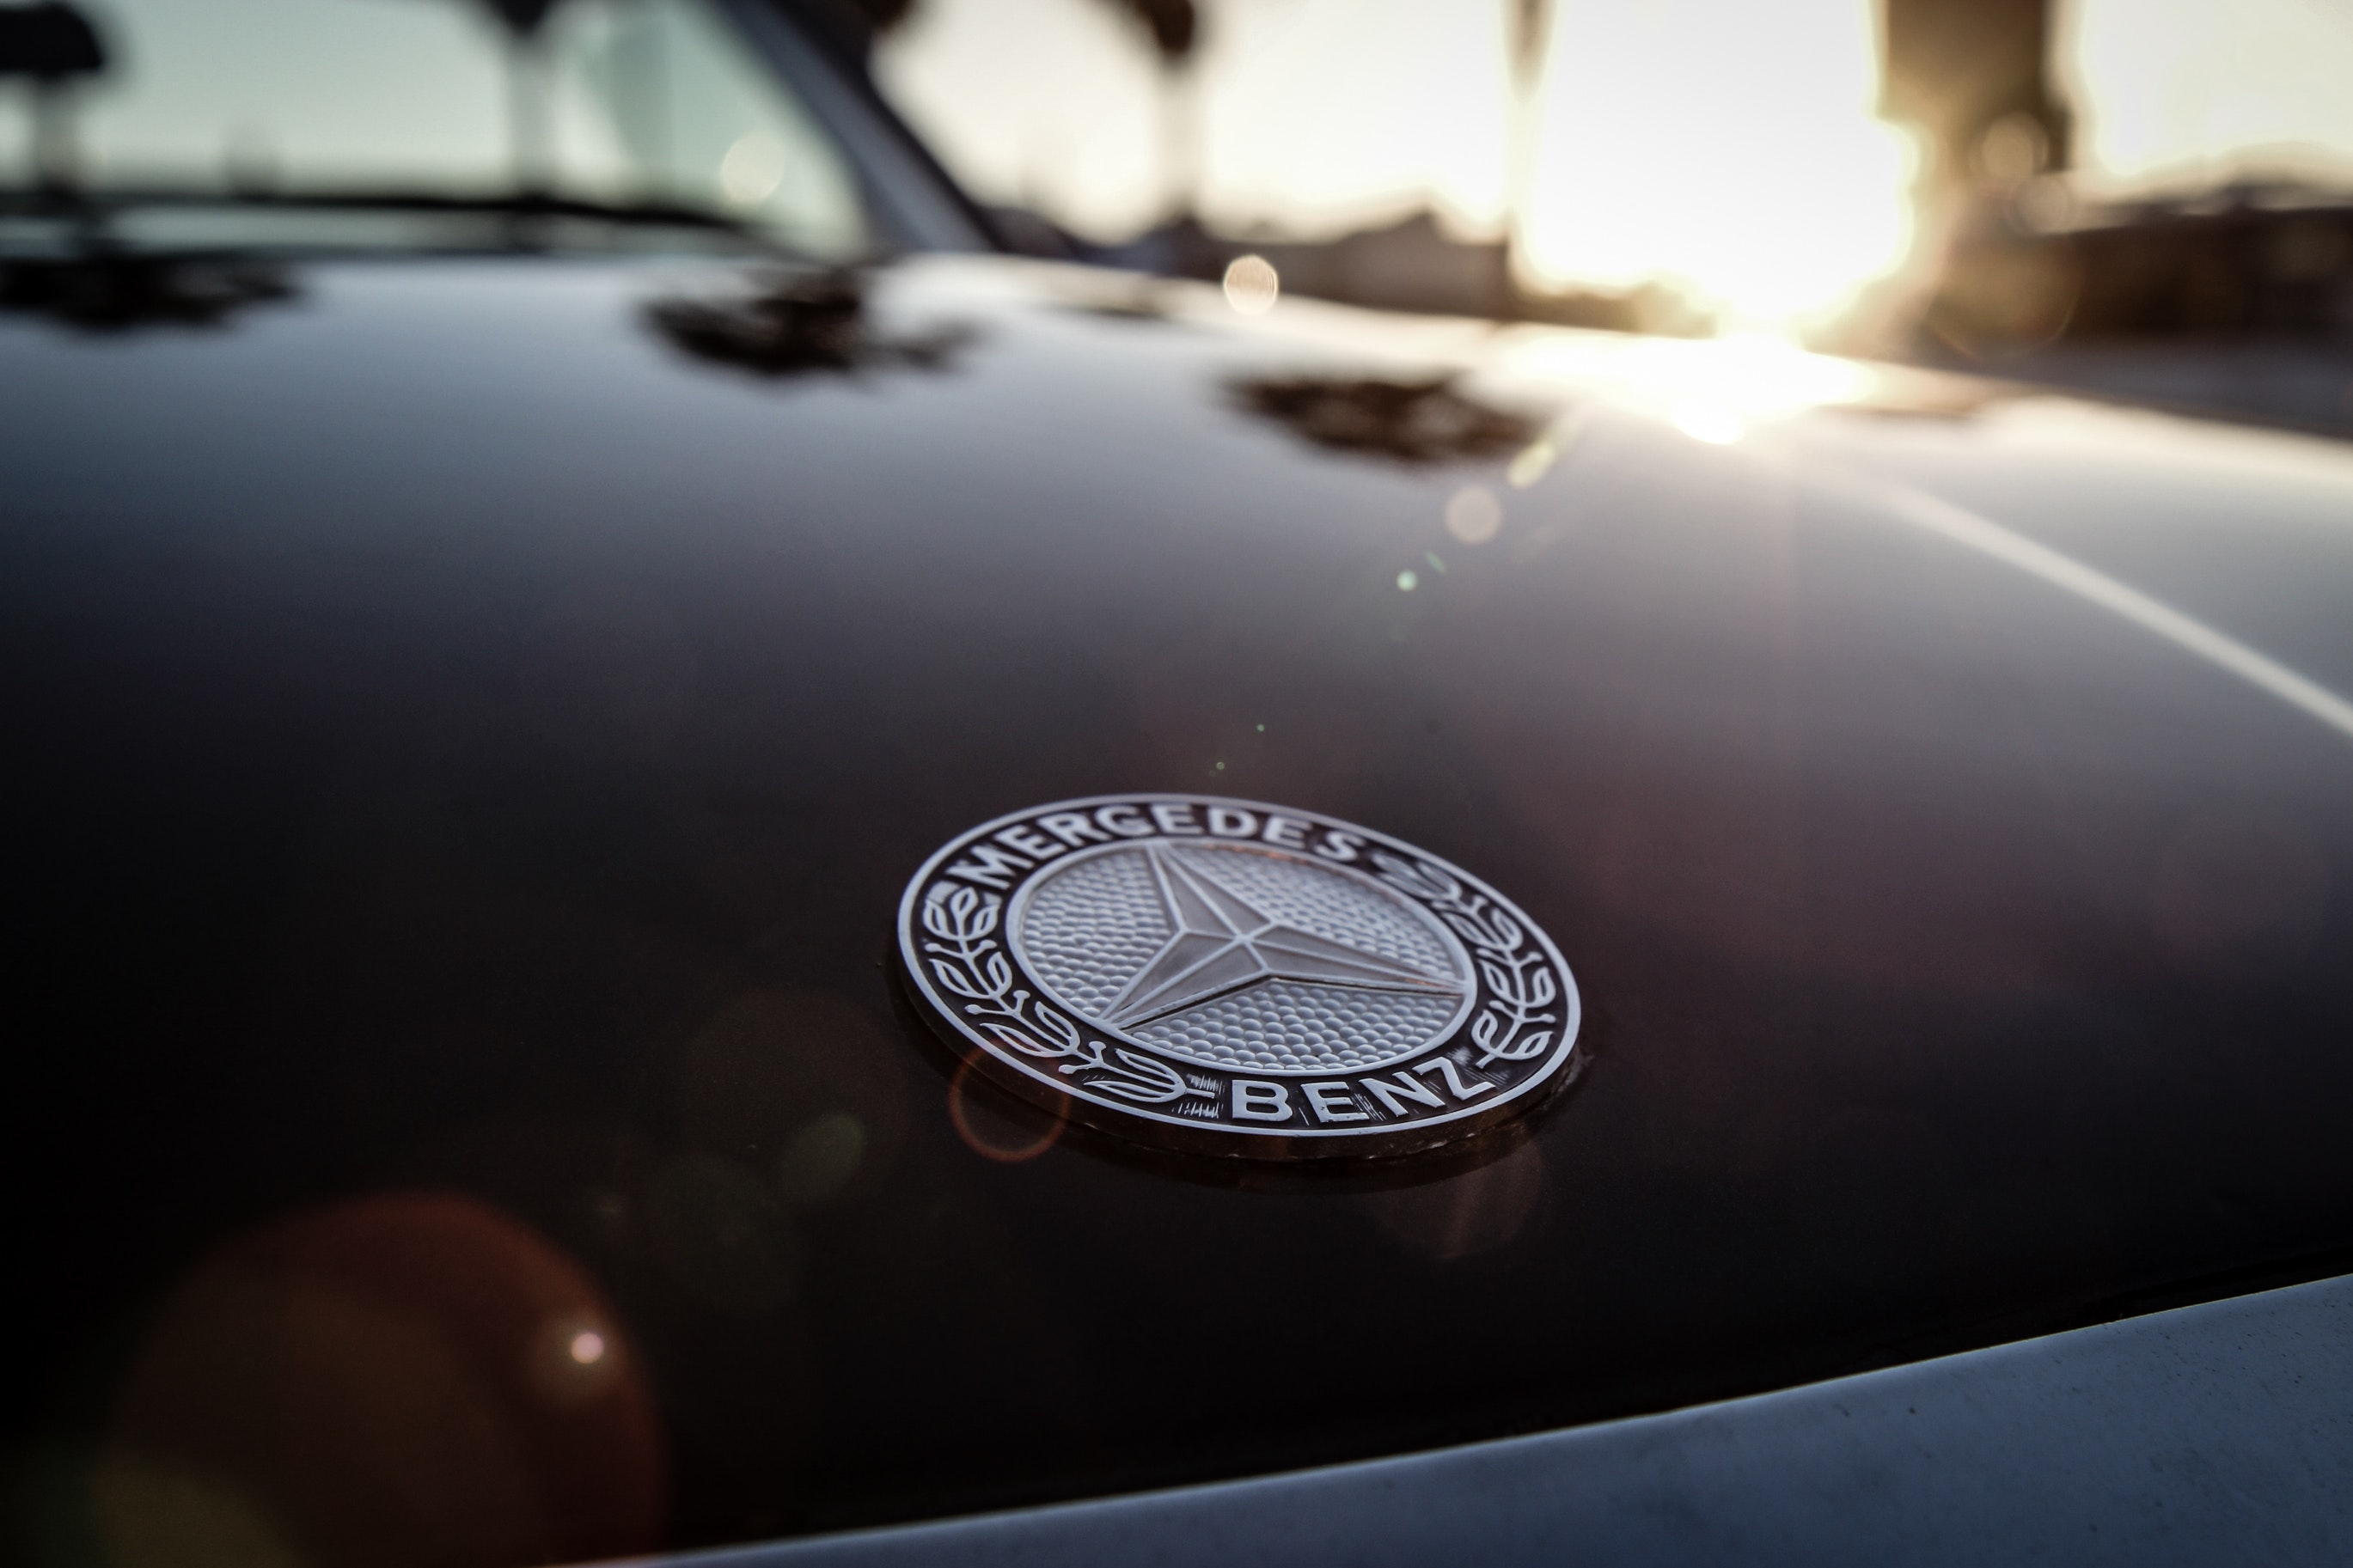 Mercedes-benz Logo, Automobile, Vehicle, Transportation system, Sunset, HQ Photo